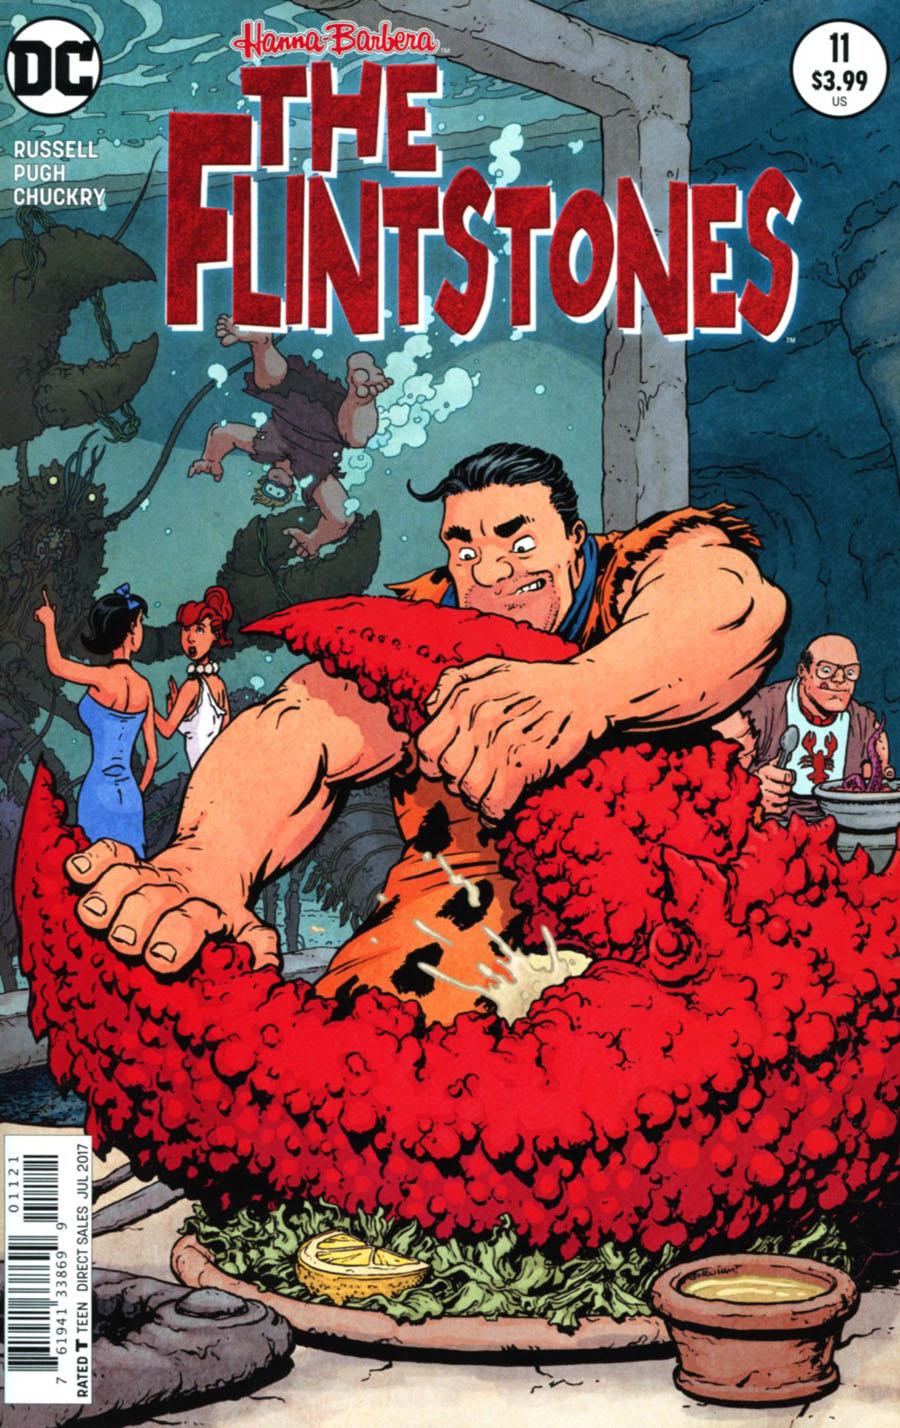 Flintstones (DC) #11 Cover B Variant Chris Burnham Cover